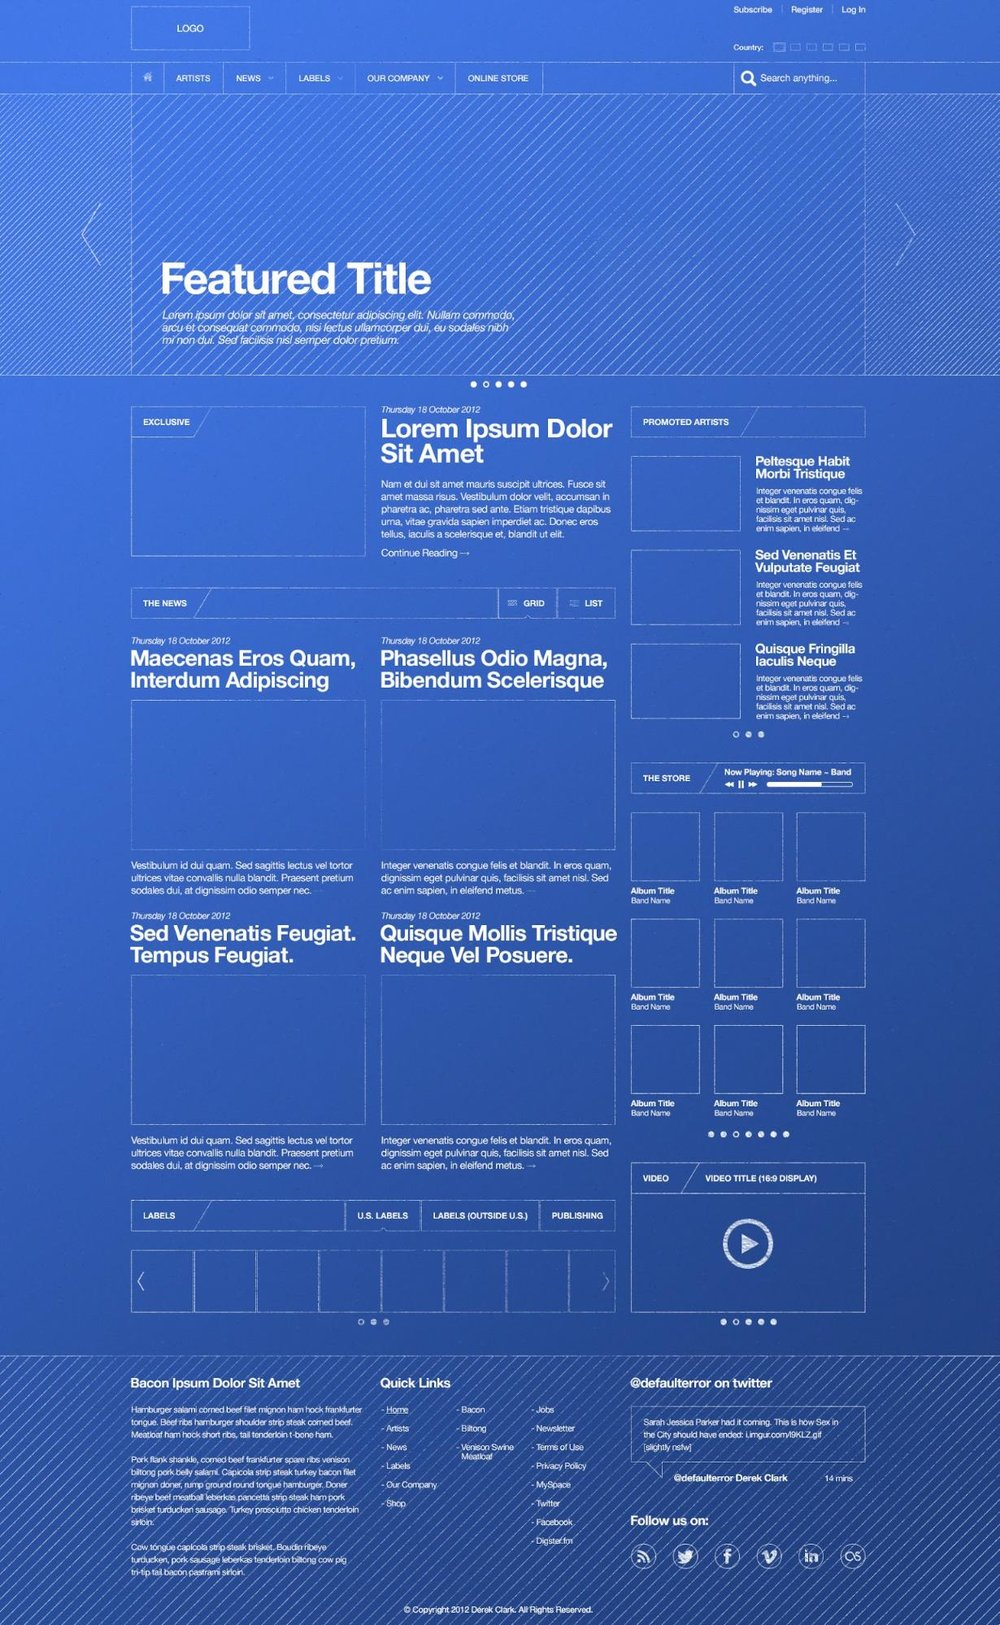 599dde98b8464a0001c15498_blue-wireframe-by-derek-clark.jpg